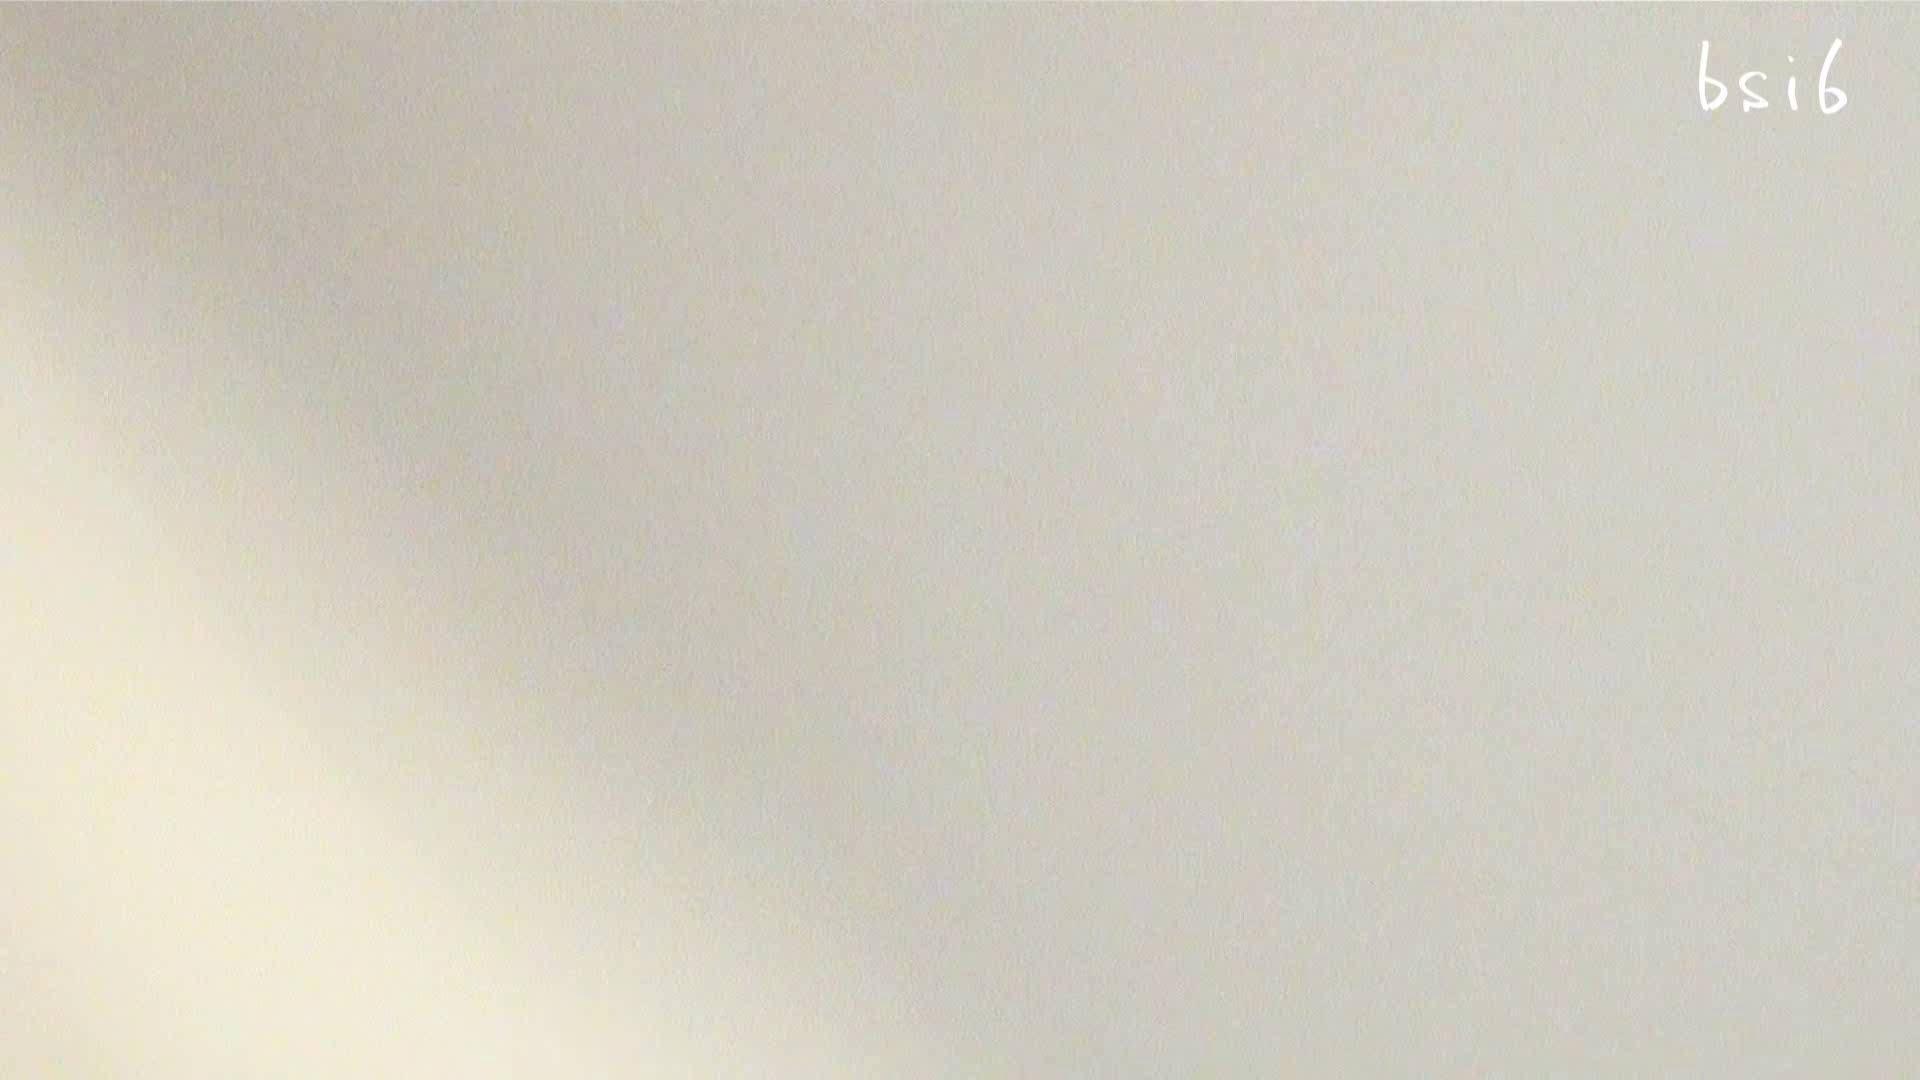 無修正エロ動画|至高下半身盗撮-PREMIUM-【院内病棟編 】VOL6|怪盗ジョーカー